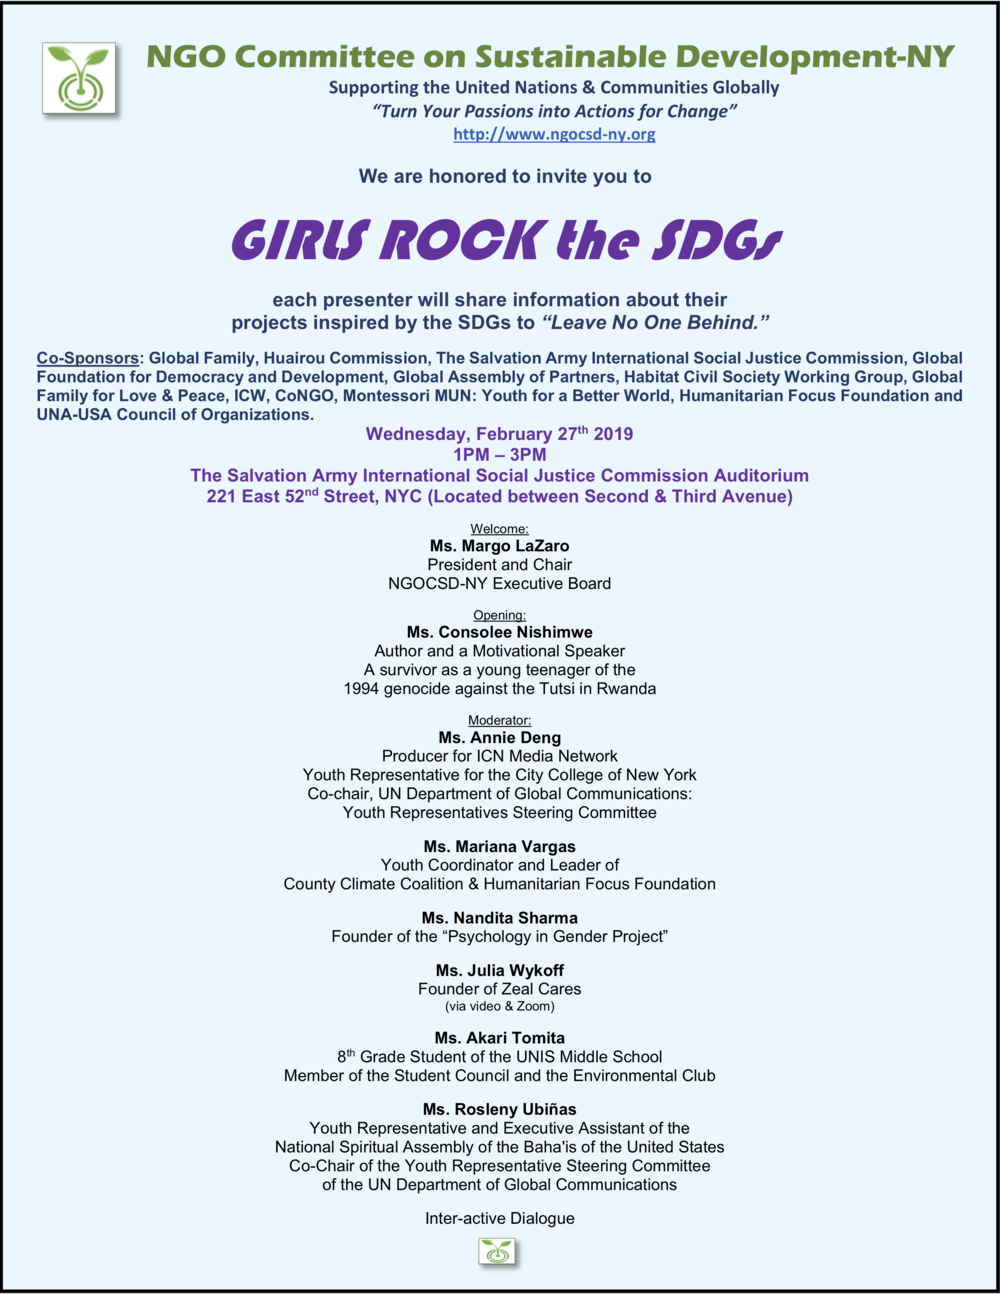 NGOCSD-NY 2-27-19 GIRLS ROCK the SDGs Invitation B1.png